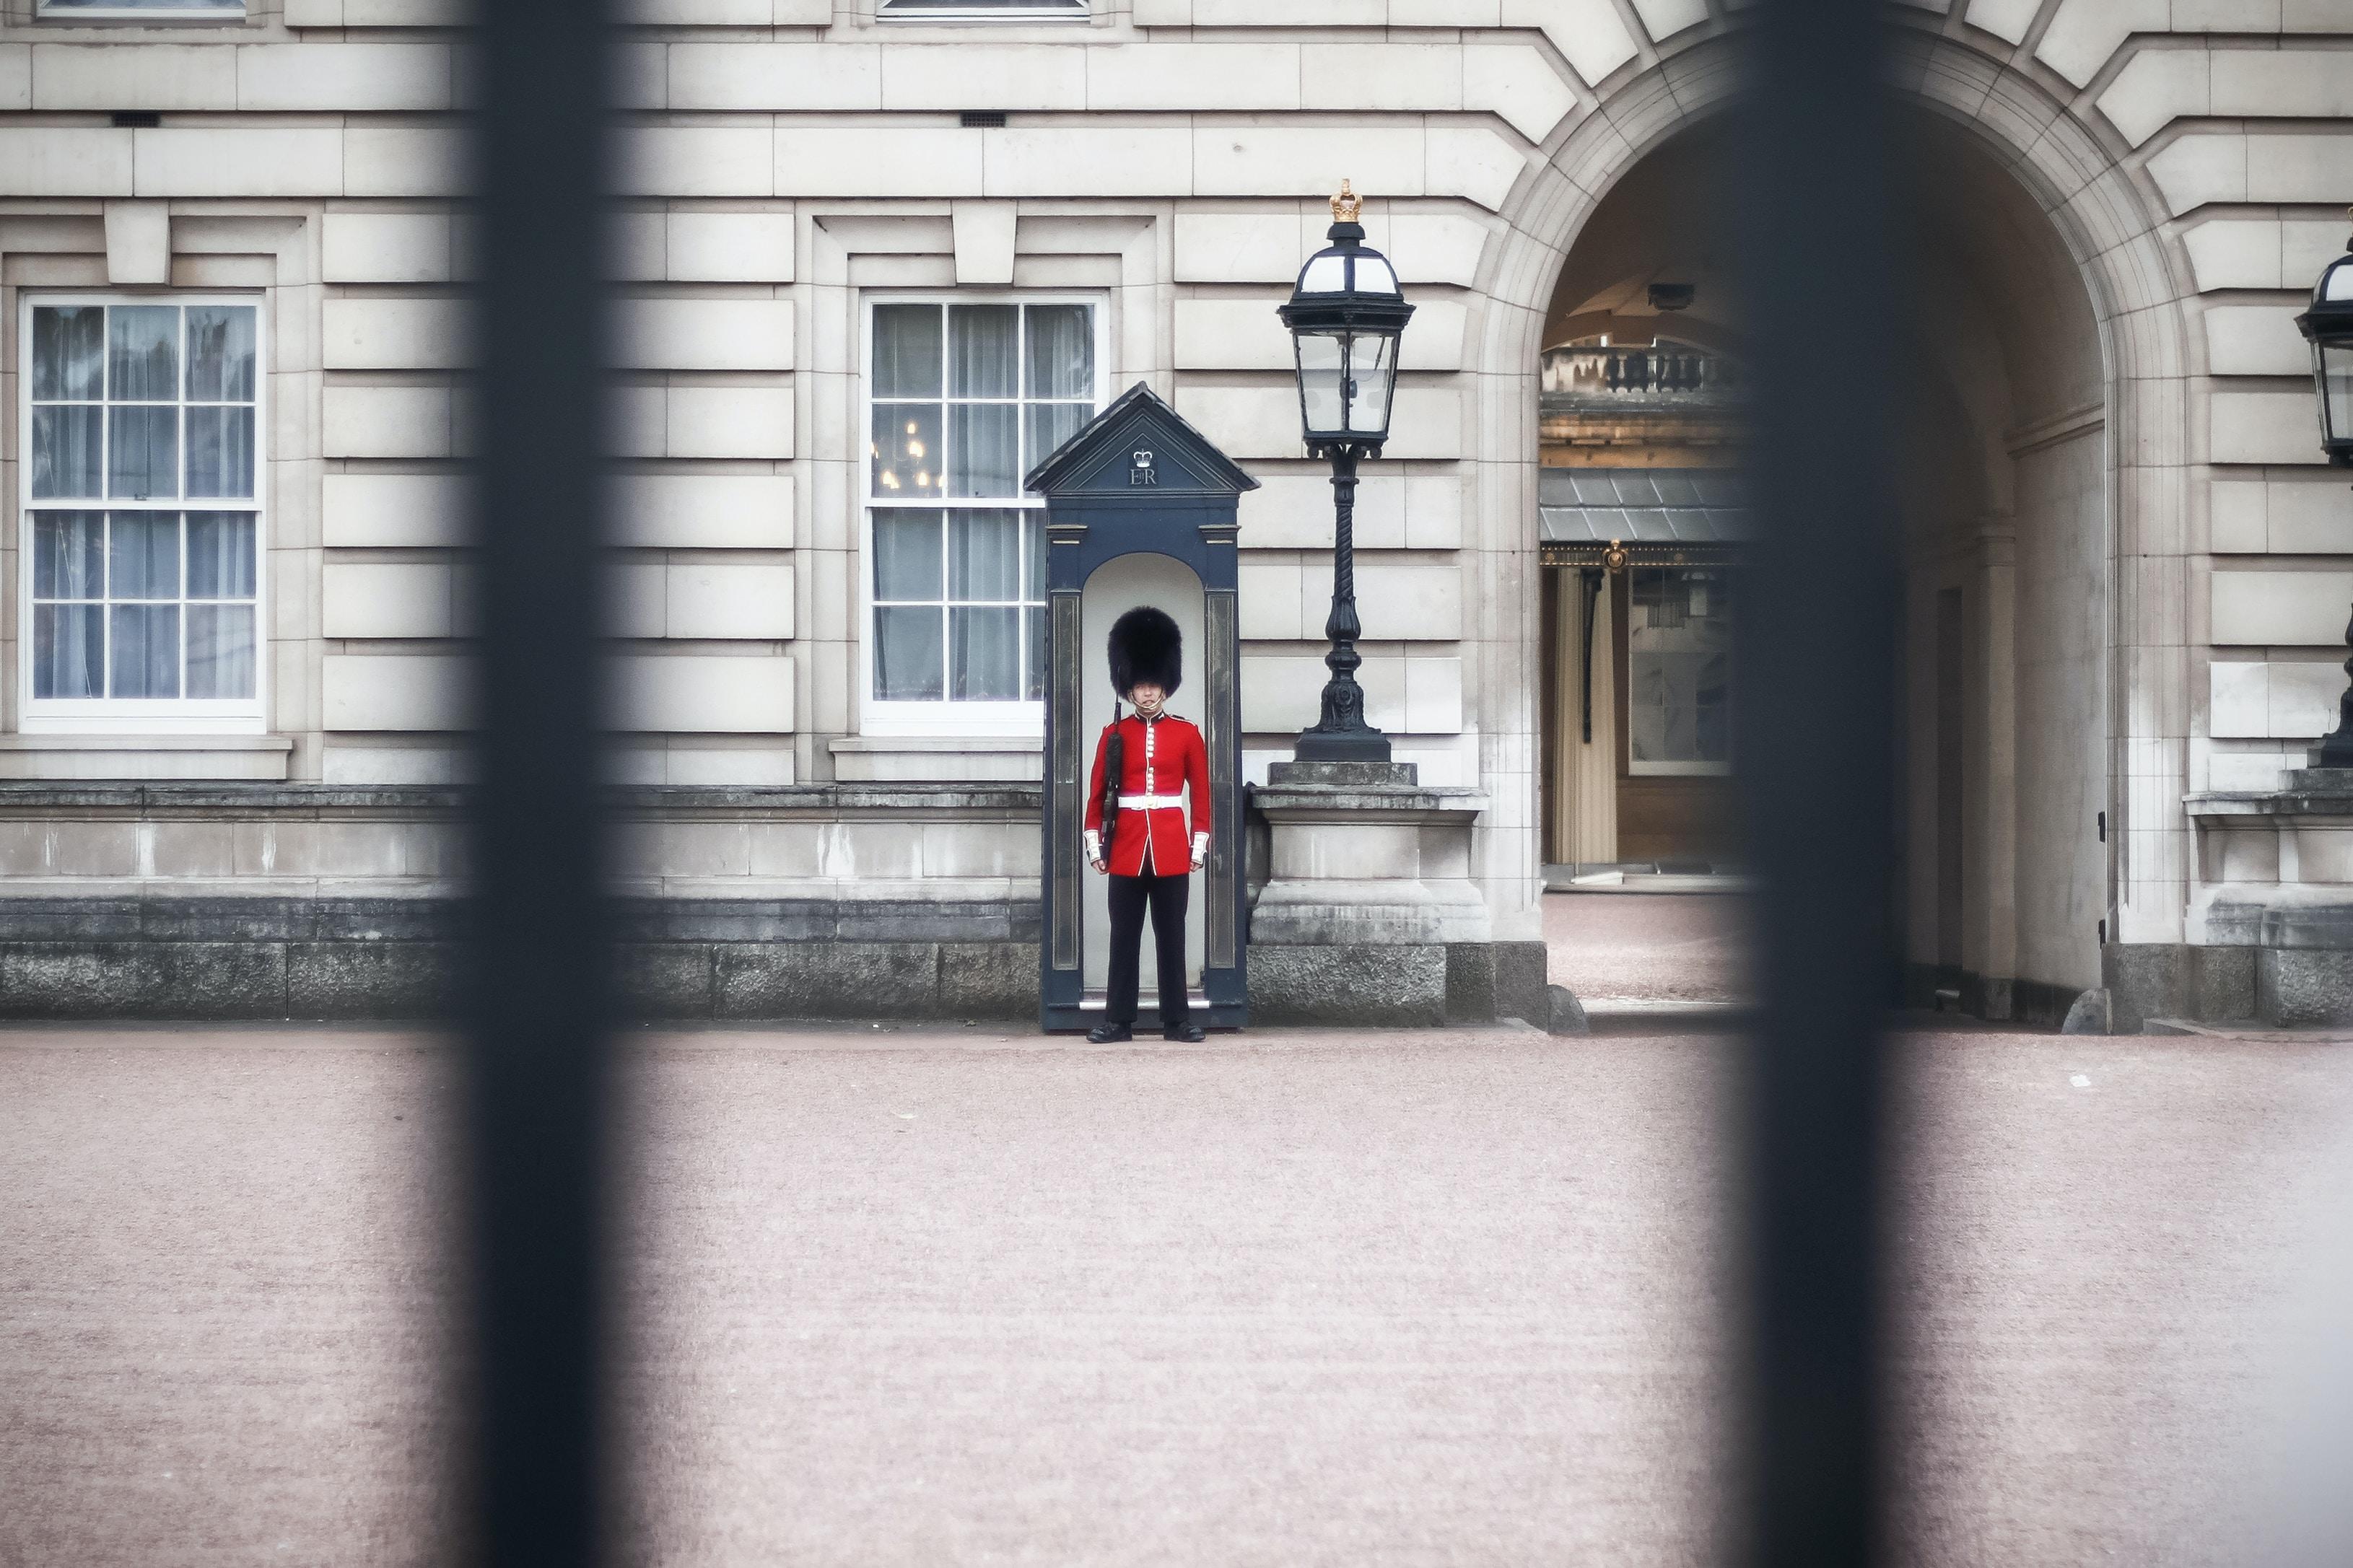 Royal Guard guarding the Buckingham Palace